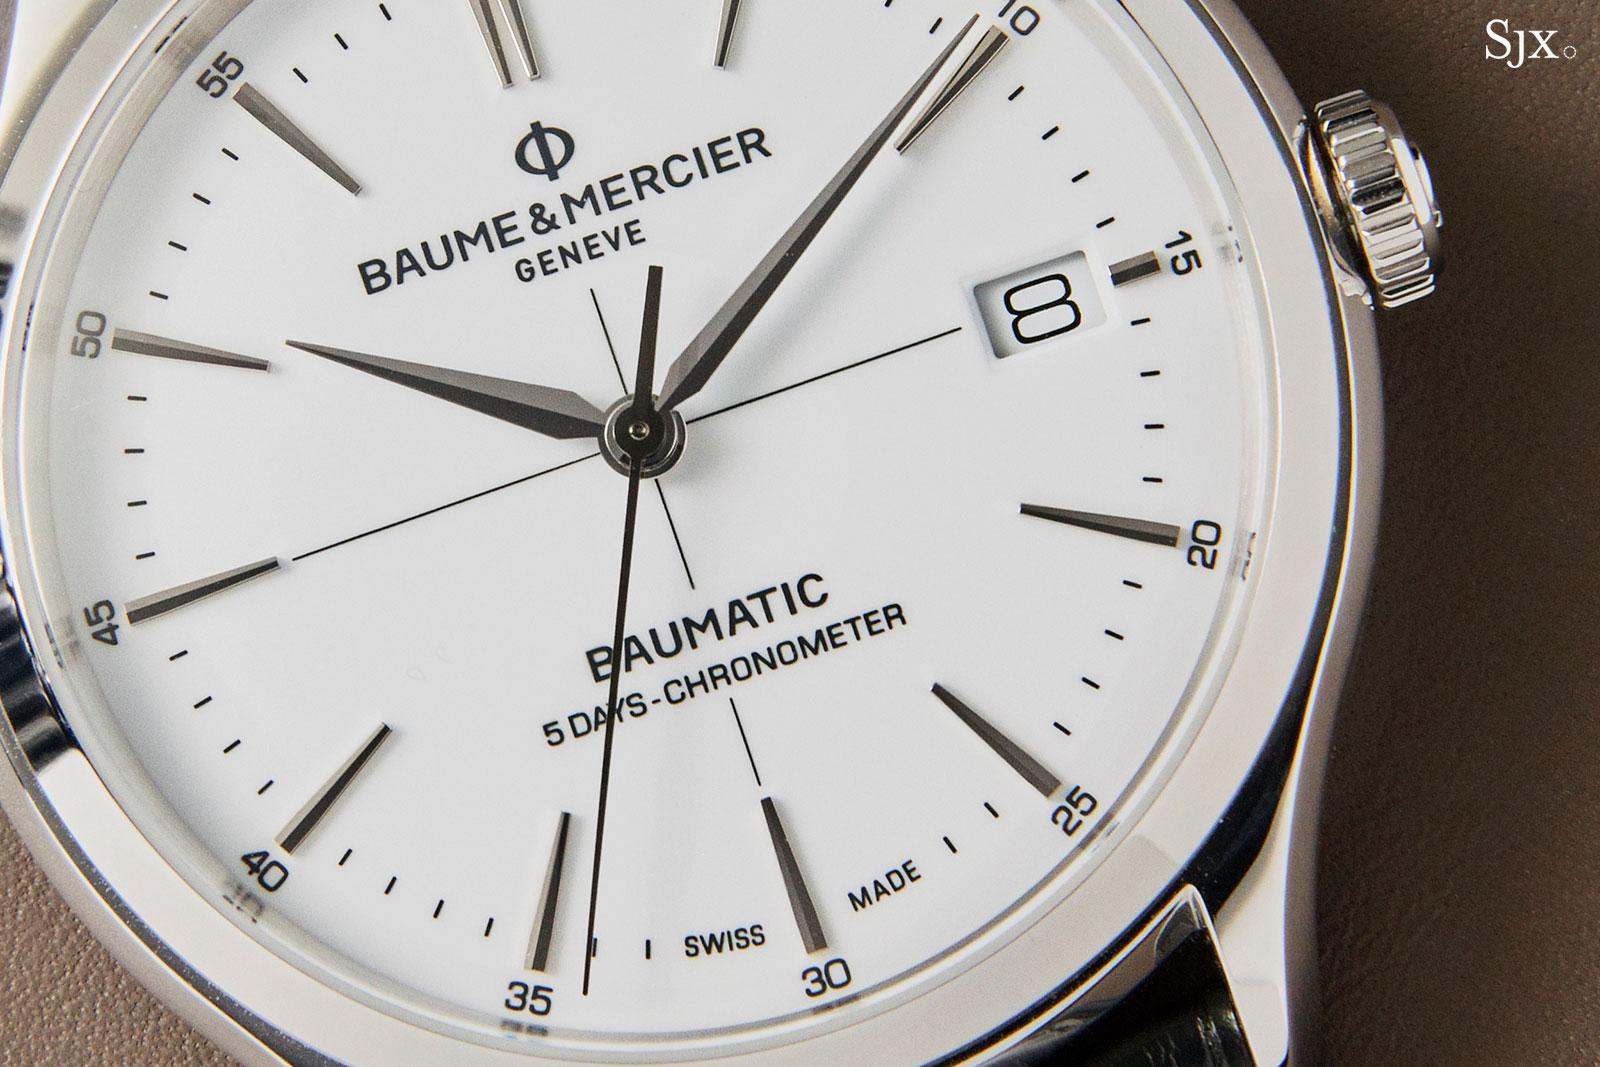 Baume Mercier Baume & Mercier Baumatic COSC chronometer 3